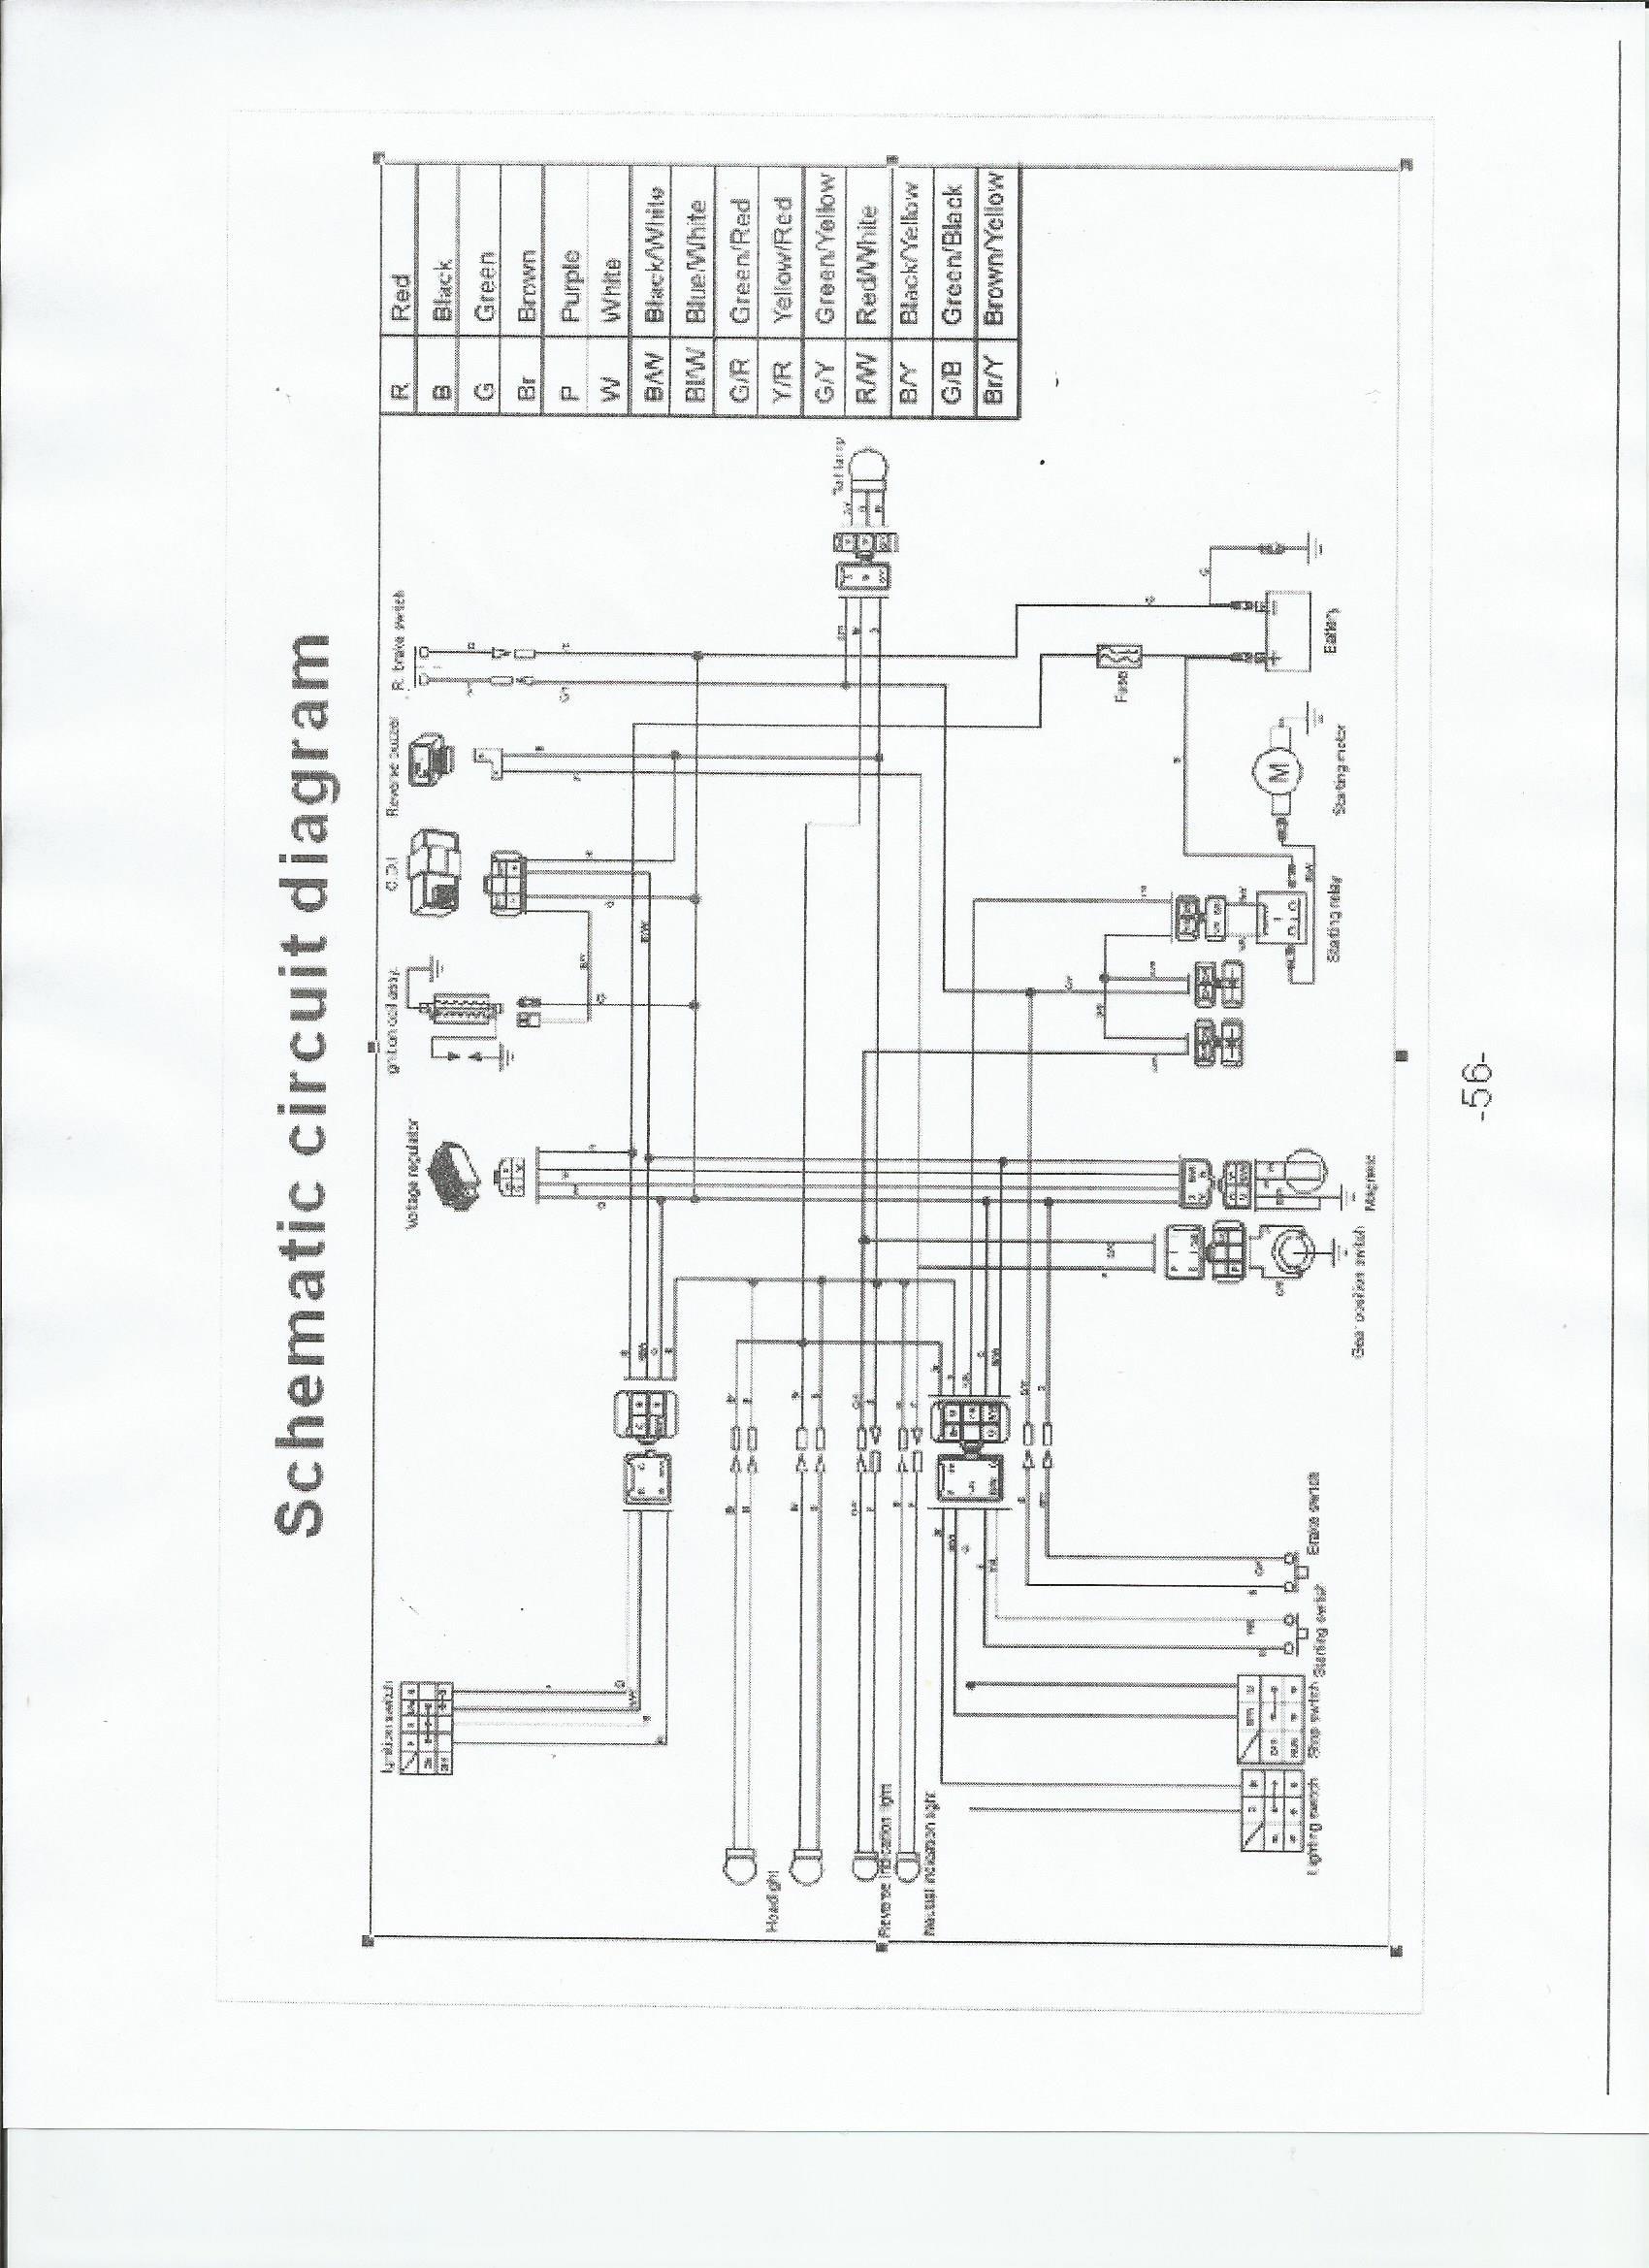 2003 Honda 400ex Wiring Schematic Content Resource Of Diagram 2008 Grizzly 450 2002 Carburetor Schematics Rh Parntesis Co Yamaha Electrical